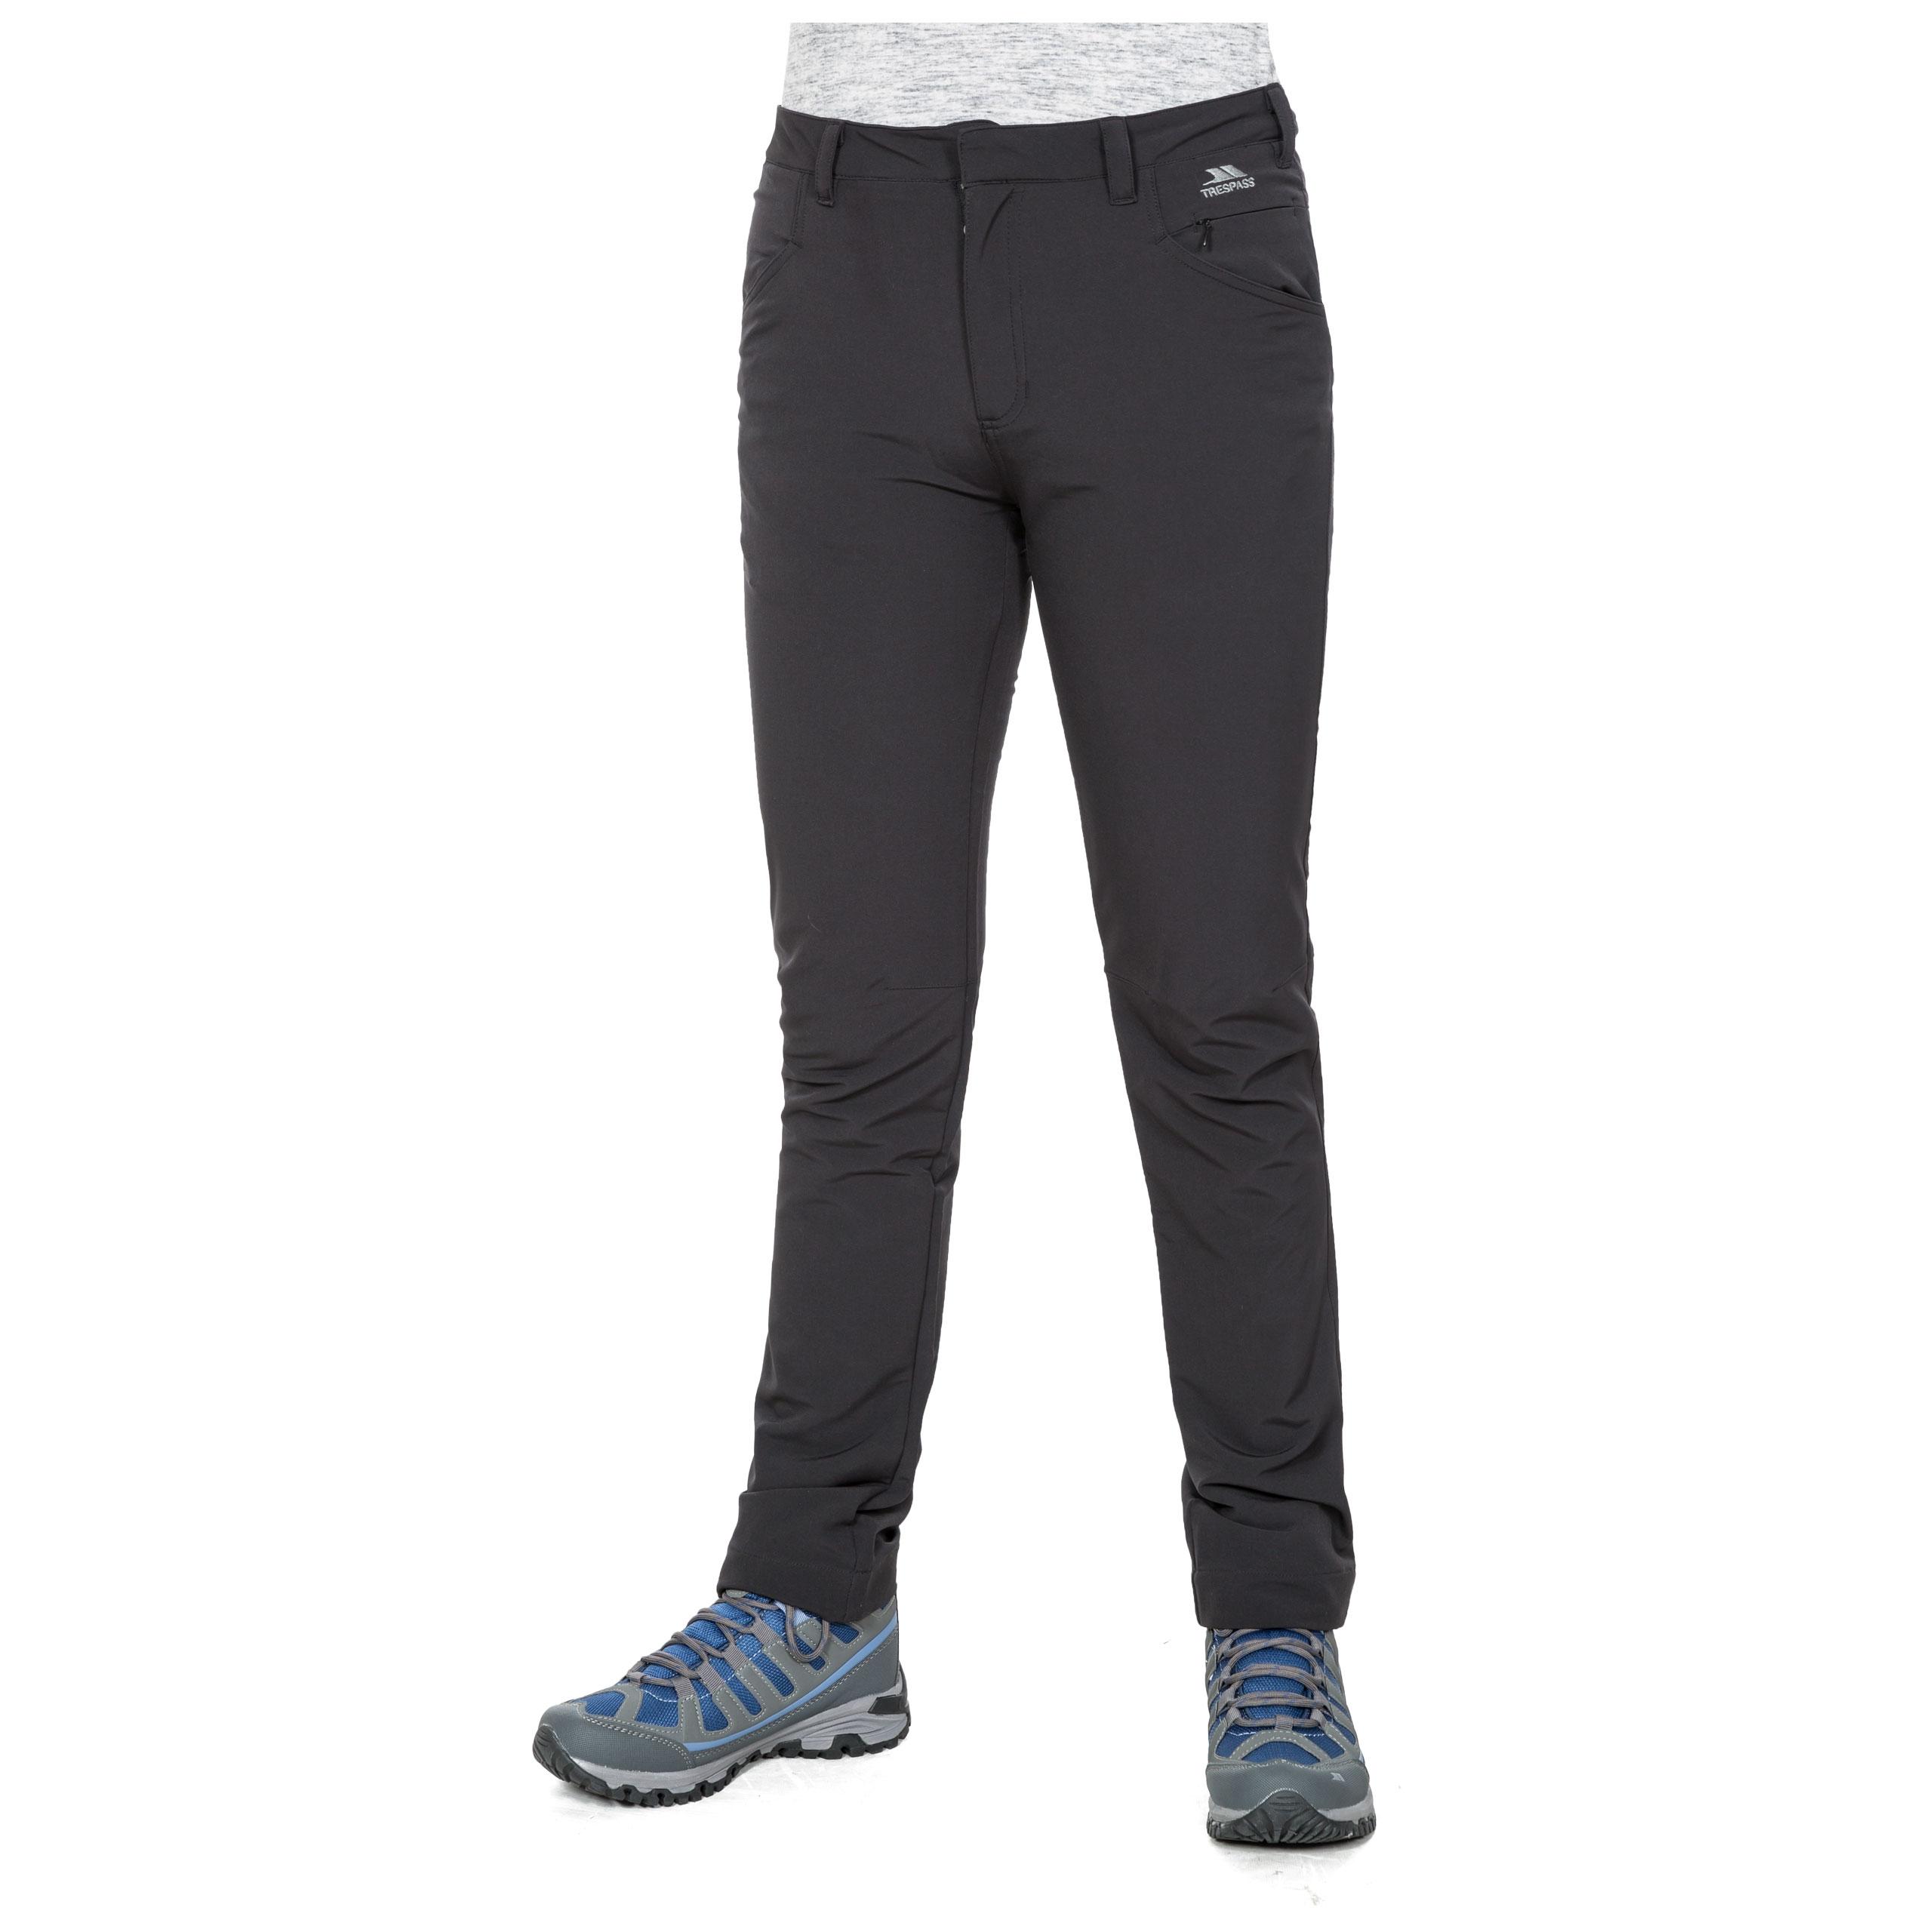 96dfed361f21 Catria Women's Slim Leg Comfort Stretch Walking Trousers | Trespass UK